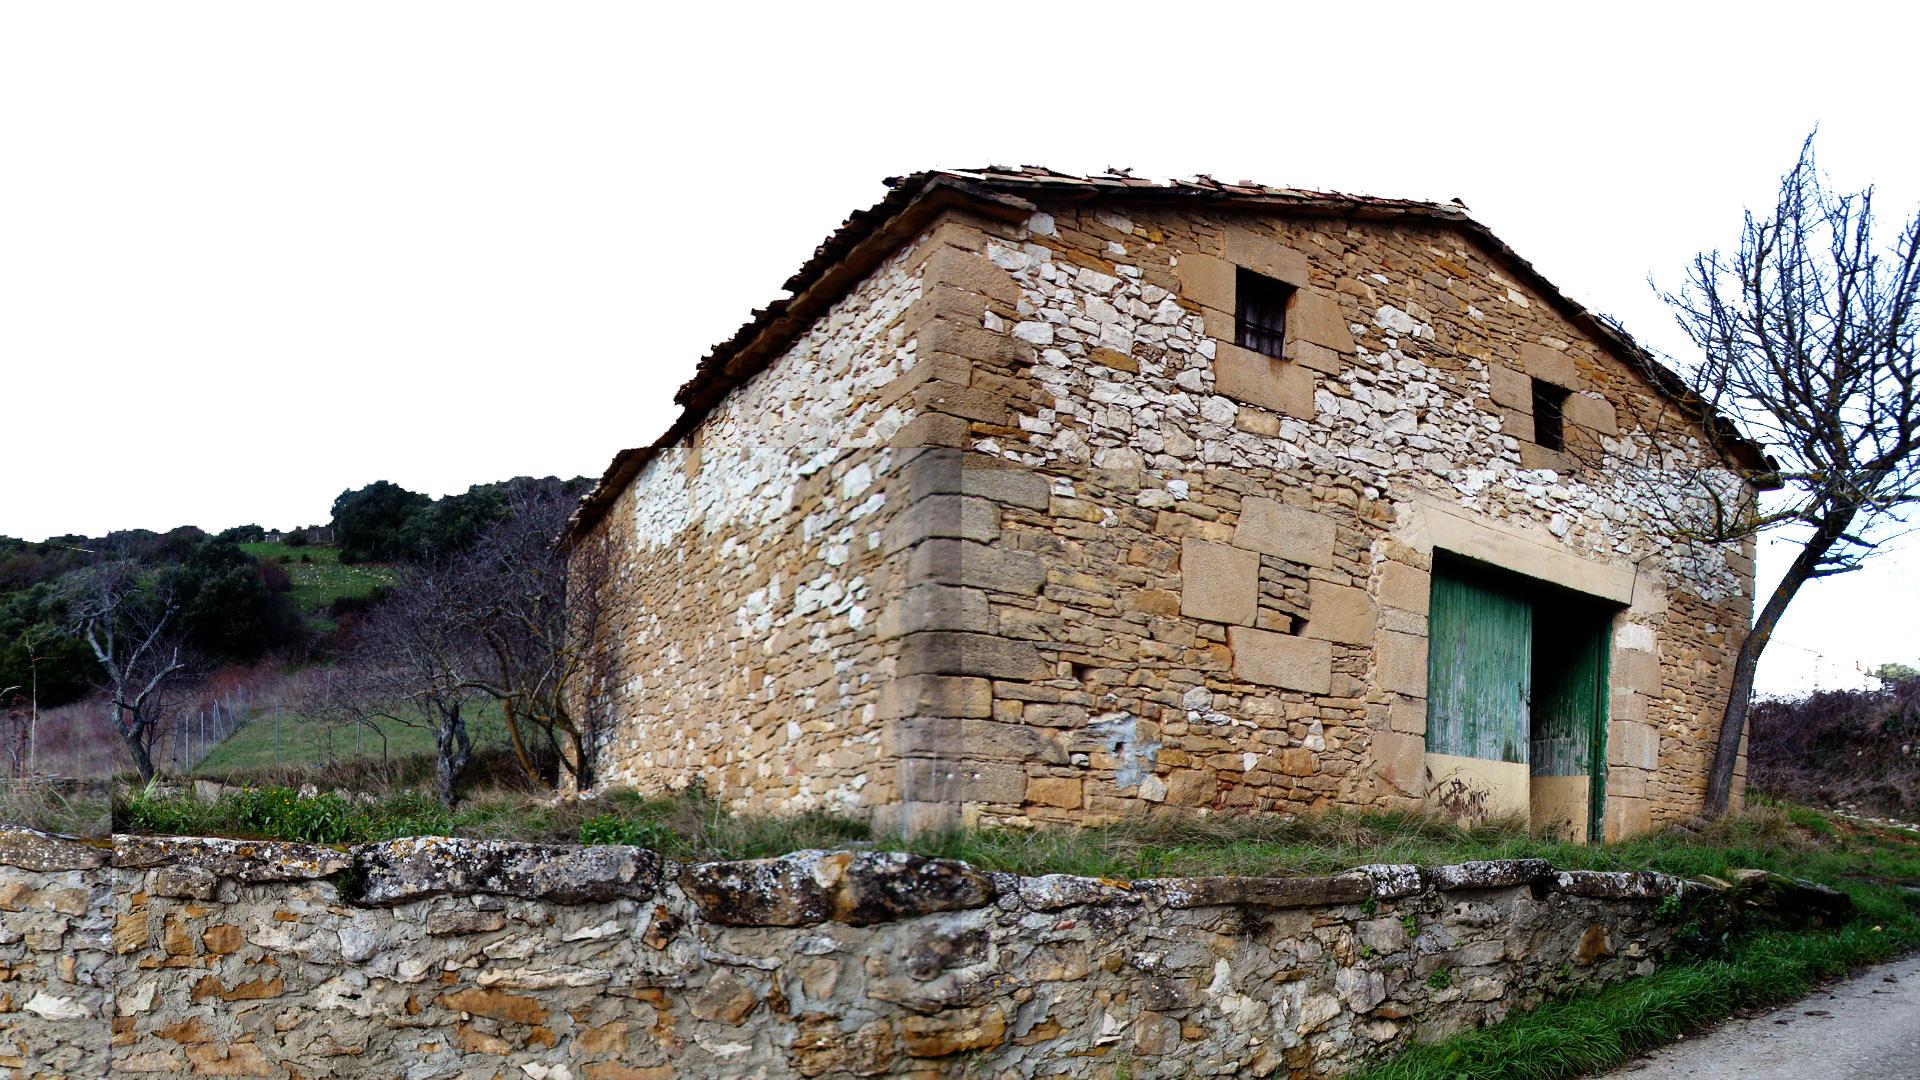 Casa eraul ping pong arquitectura - Casa de materiales ...